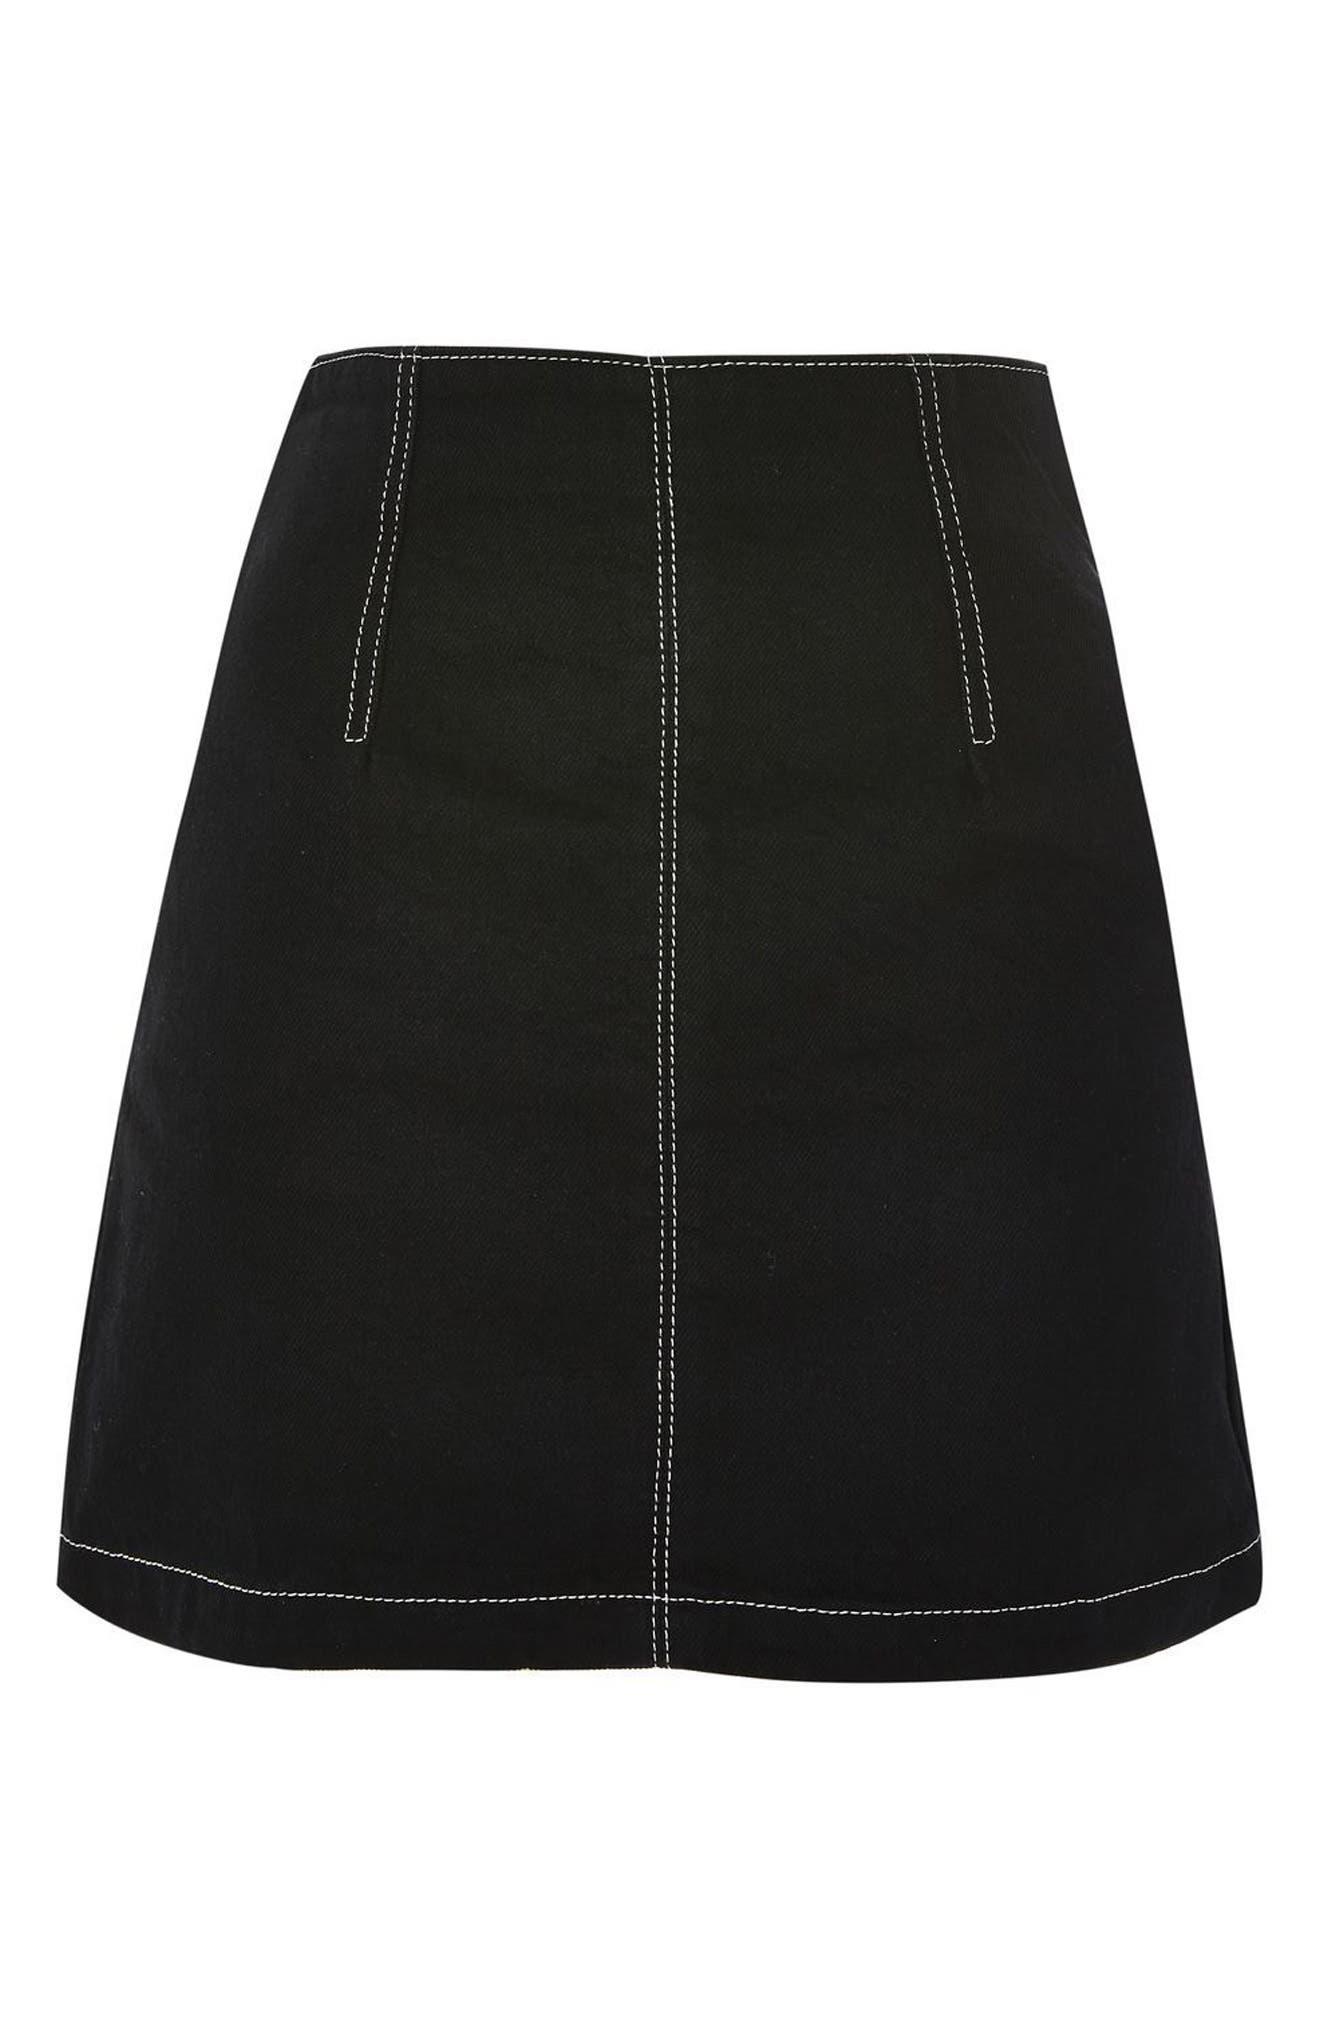 Alternate Image 3  - Topshop Contrast Stitch Denim Skirt